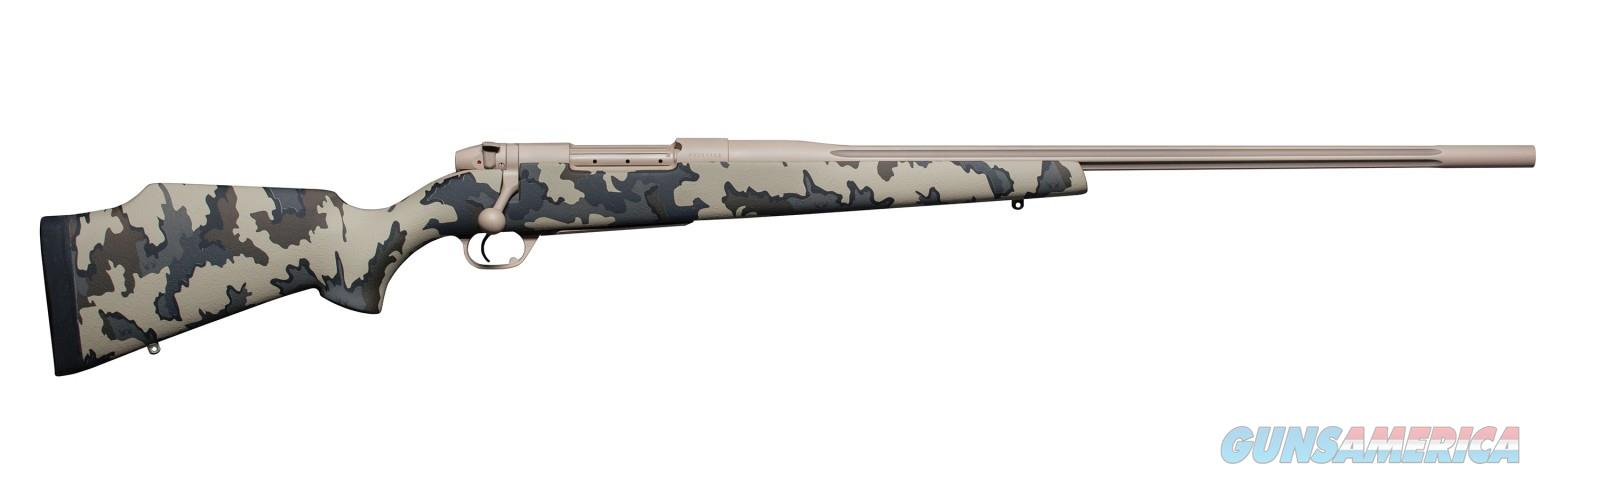 "Weatherby Mark V Arroyo .240 Wby Mag 24"" KUIU Vias MAOS240WR4O   Guns > Rifles > Weatherby Rifles > Sporting"